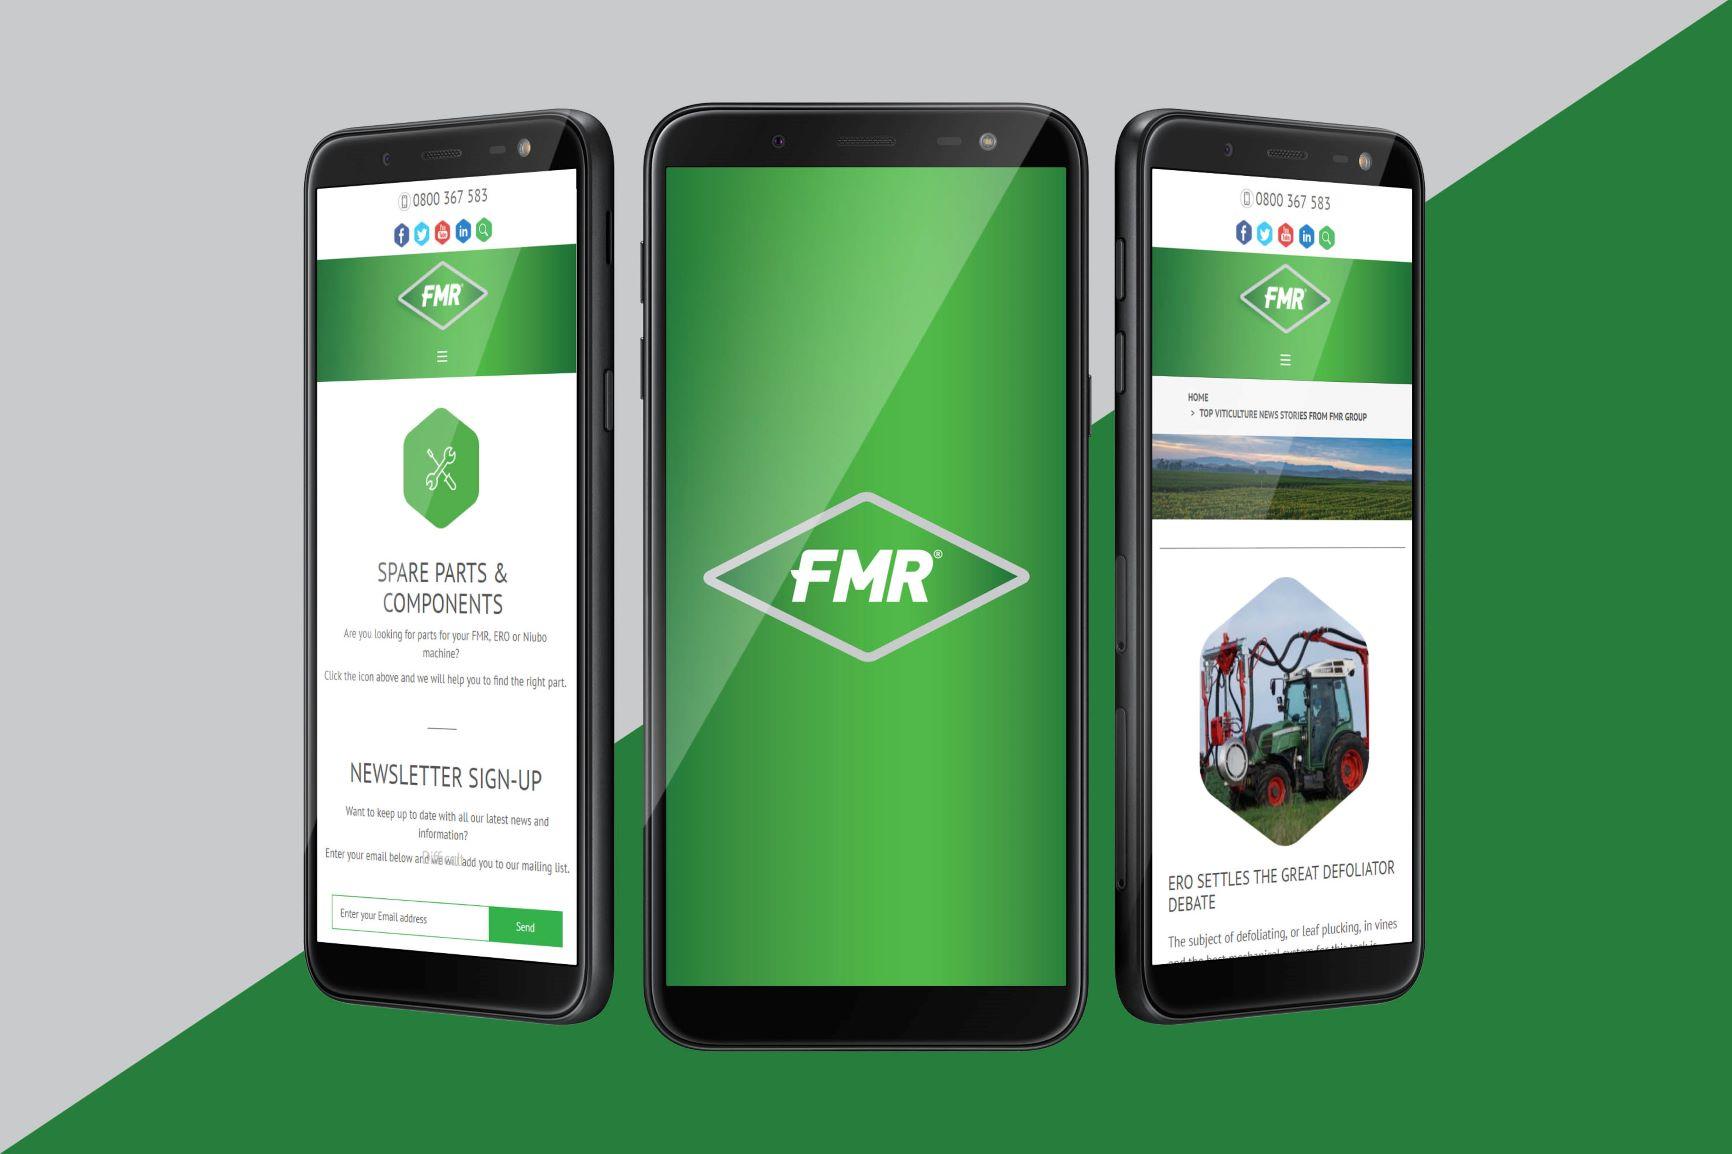 App Phone mock-up 3 downsized